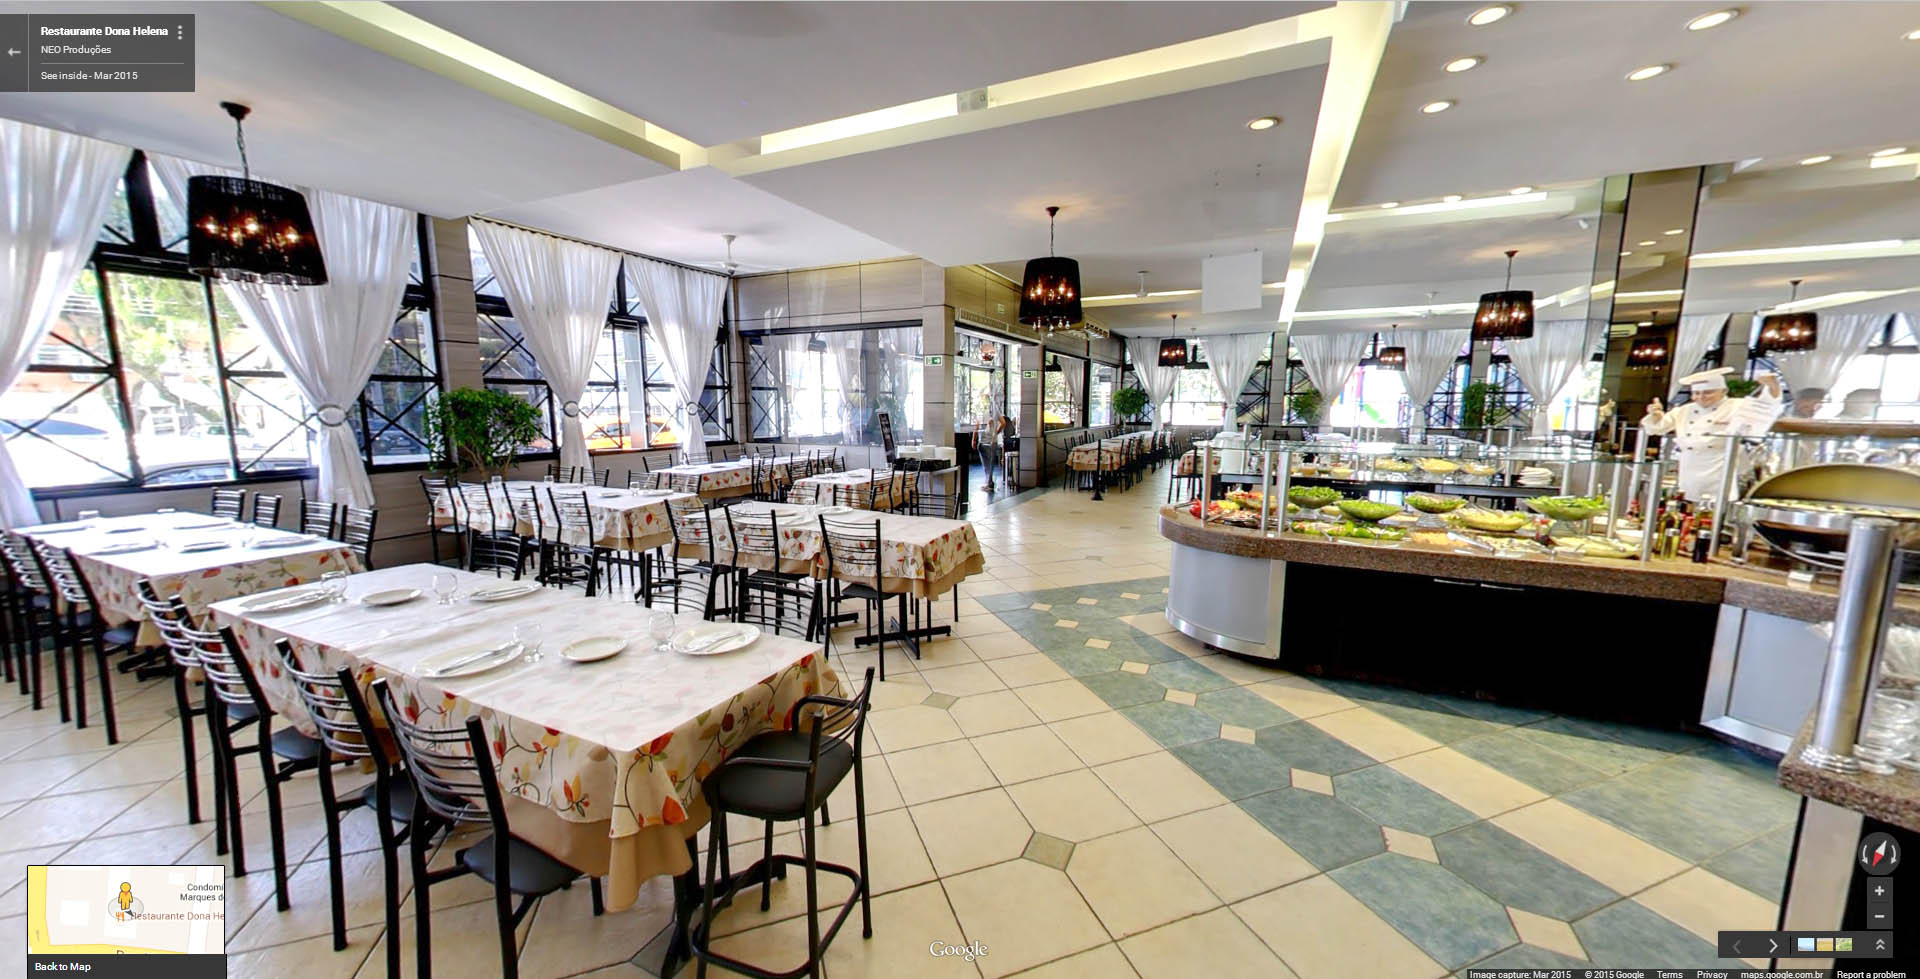 Restaurante Dona Helena